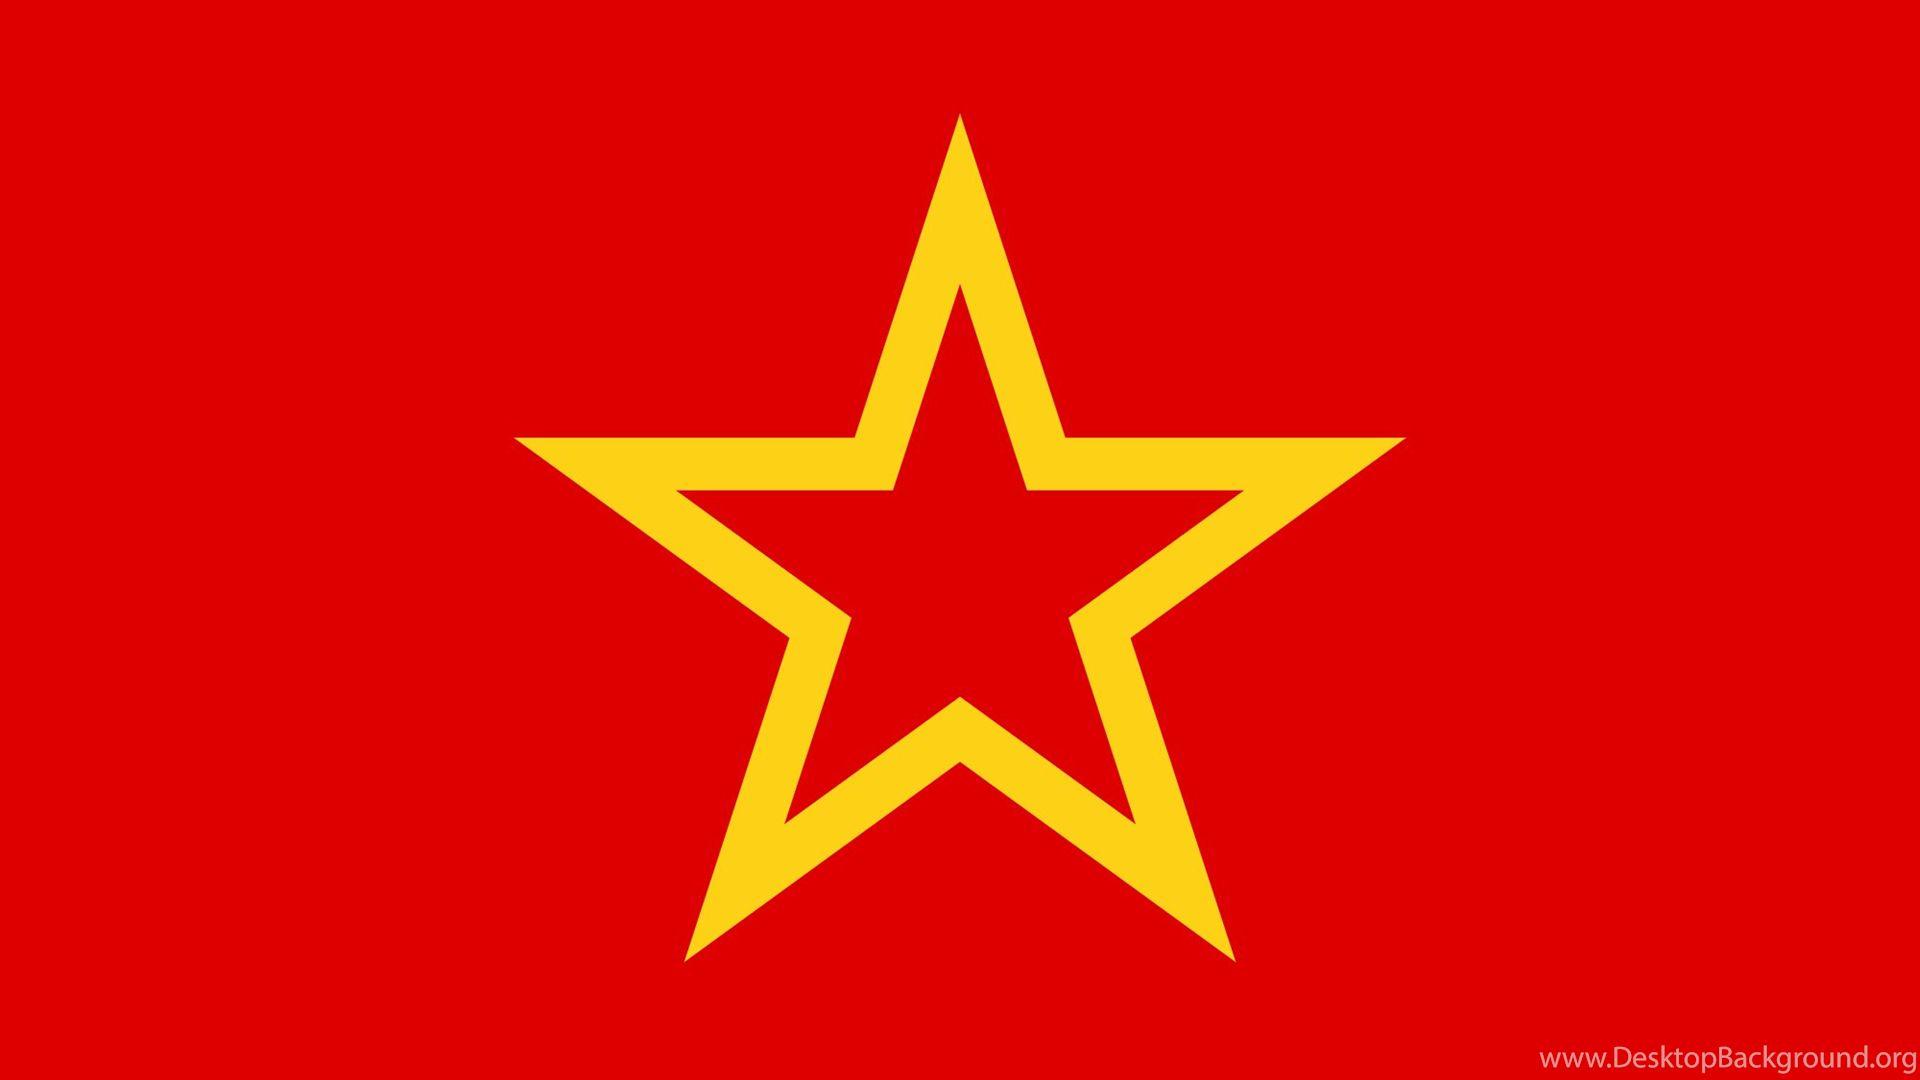 Communism wallpaper photo full hd